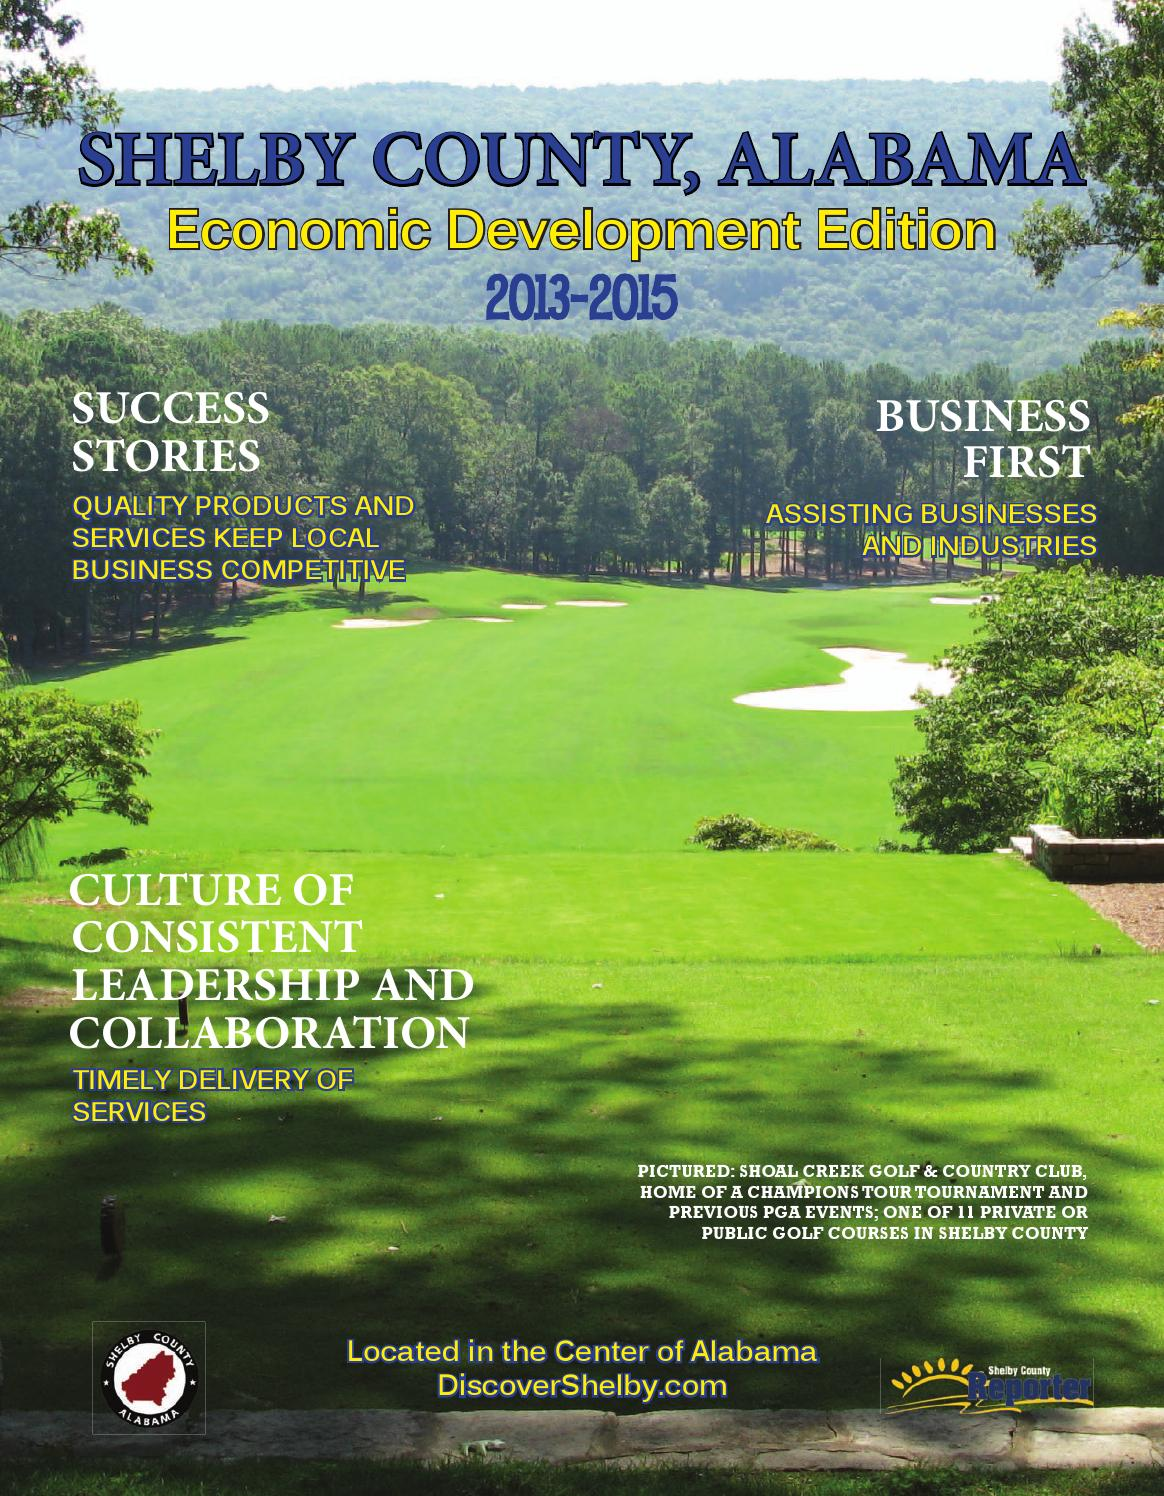 Alabama shelby county wilton - Shelby County Economic Development By Shelby County Newspapers Inc Issuu